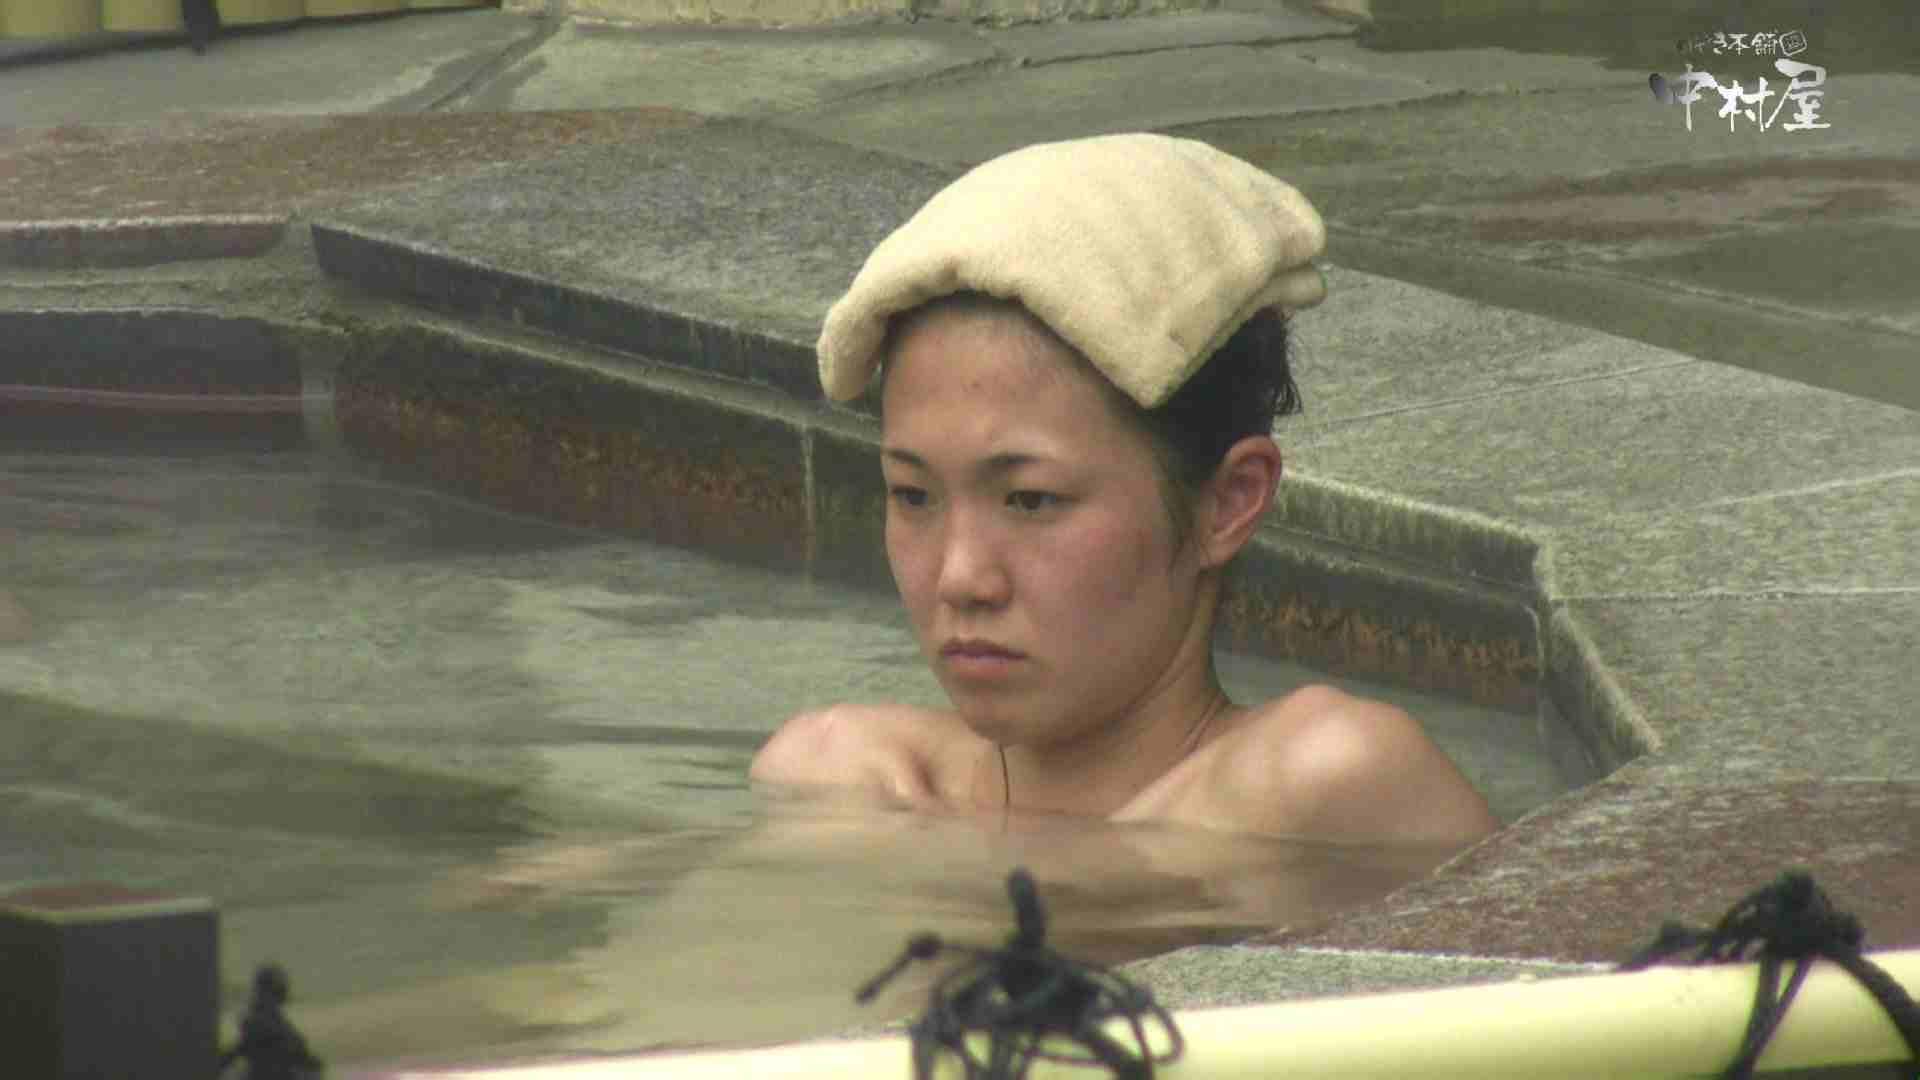 Aquaな露天風呂Vol.889 0   0  87連発 87